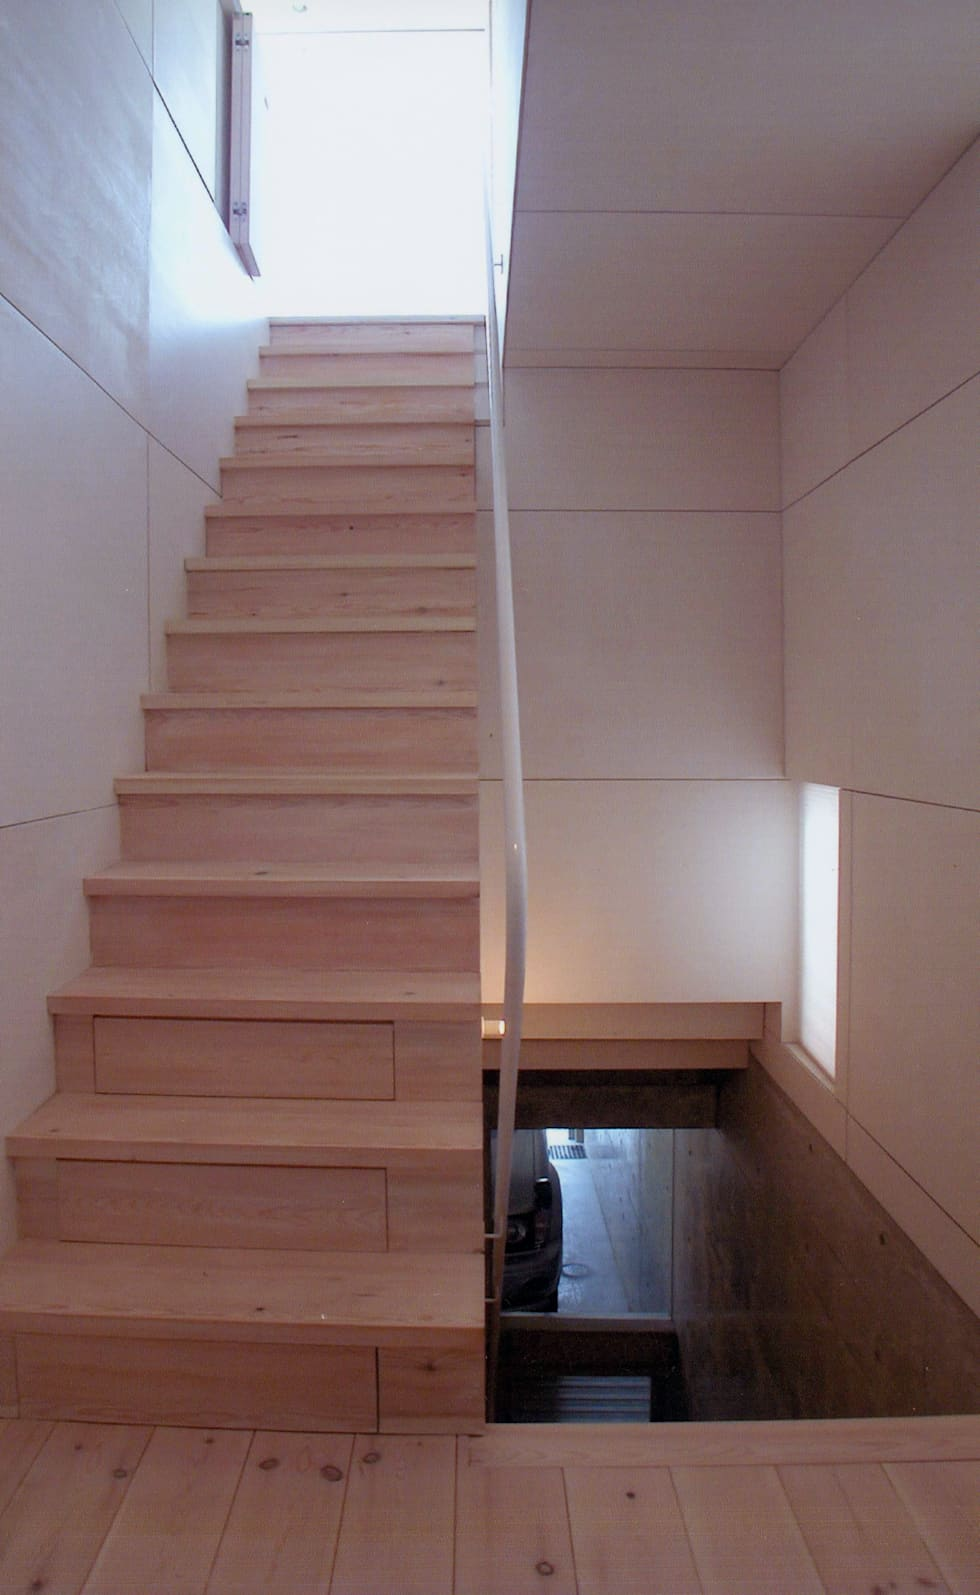 K&K-HOUSE 階段: M4建築設計室が手掛けた廊下 & 玄関です。